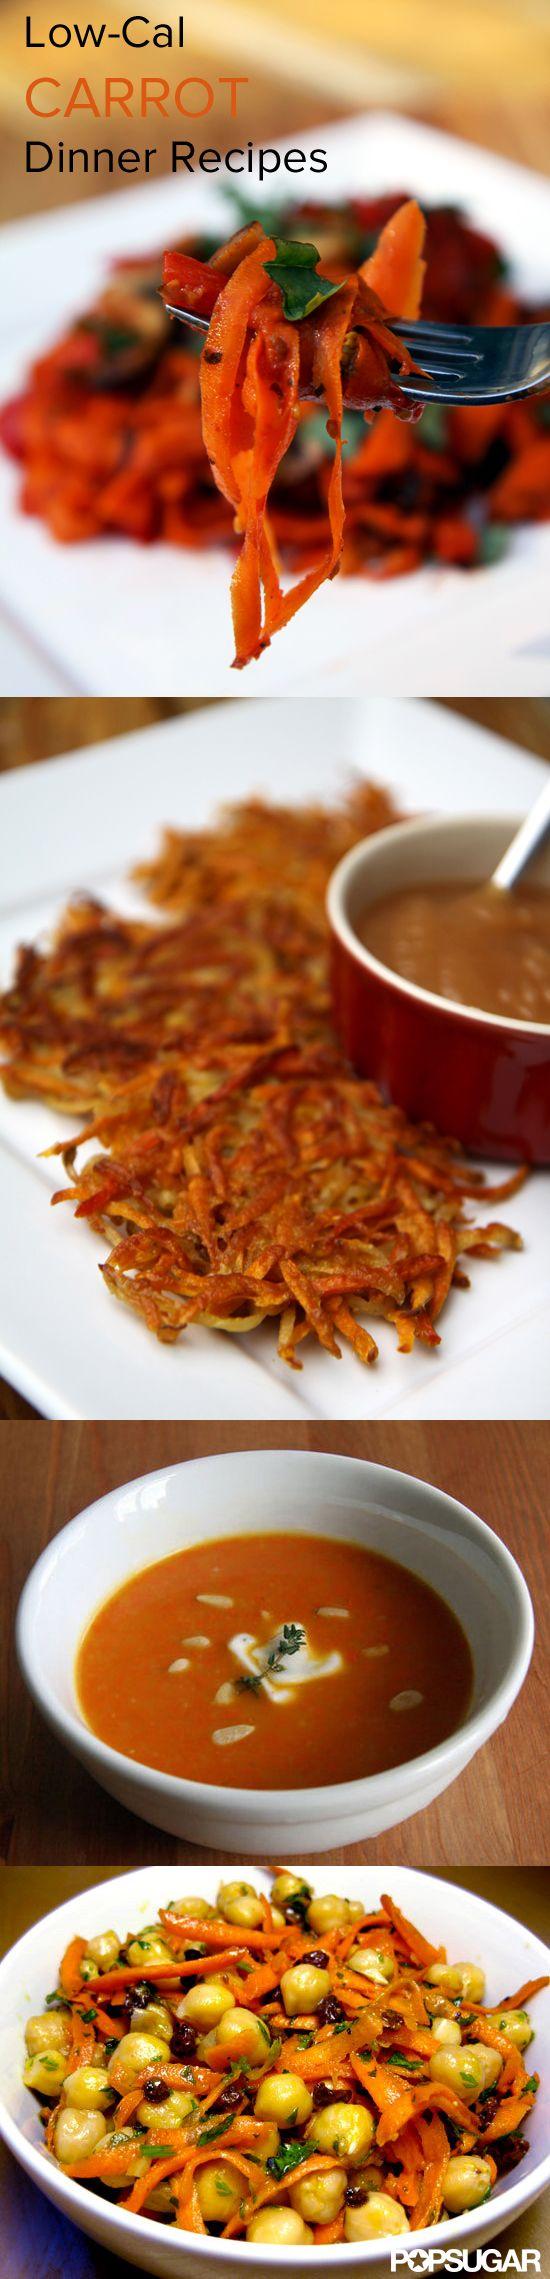 Low-cal carrot dinner recipes.